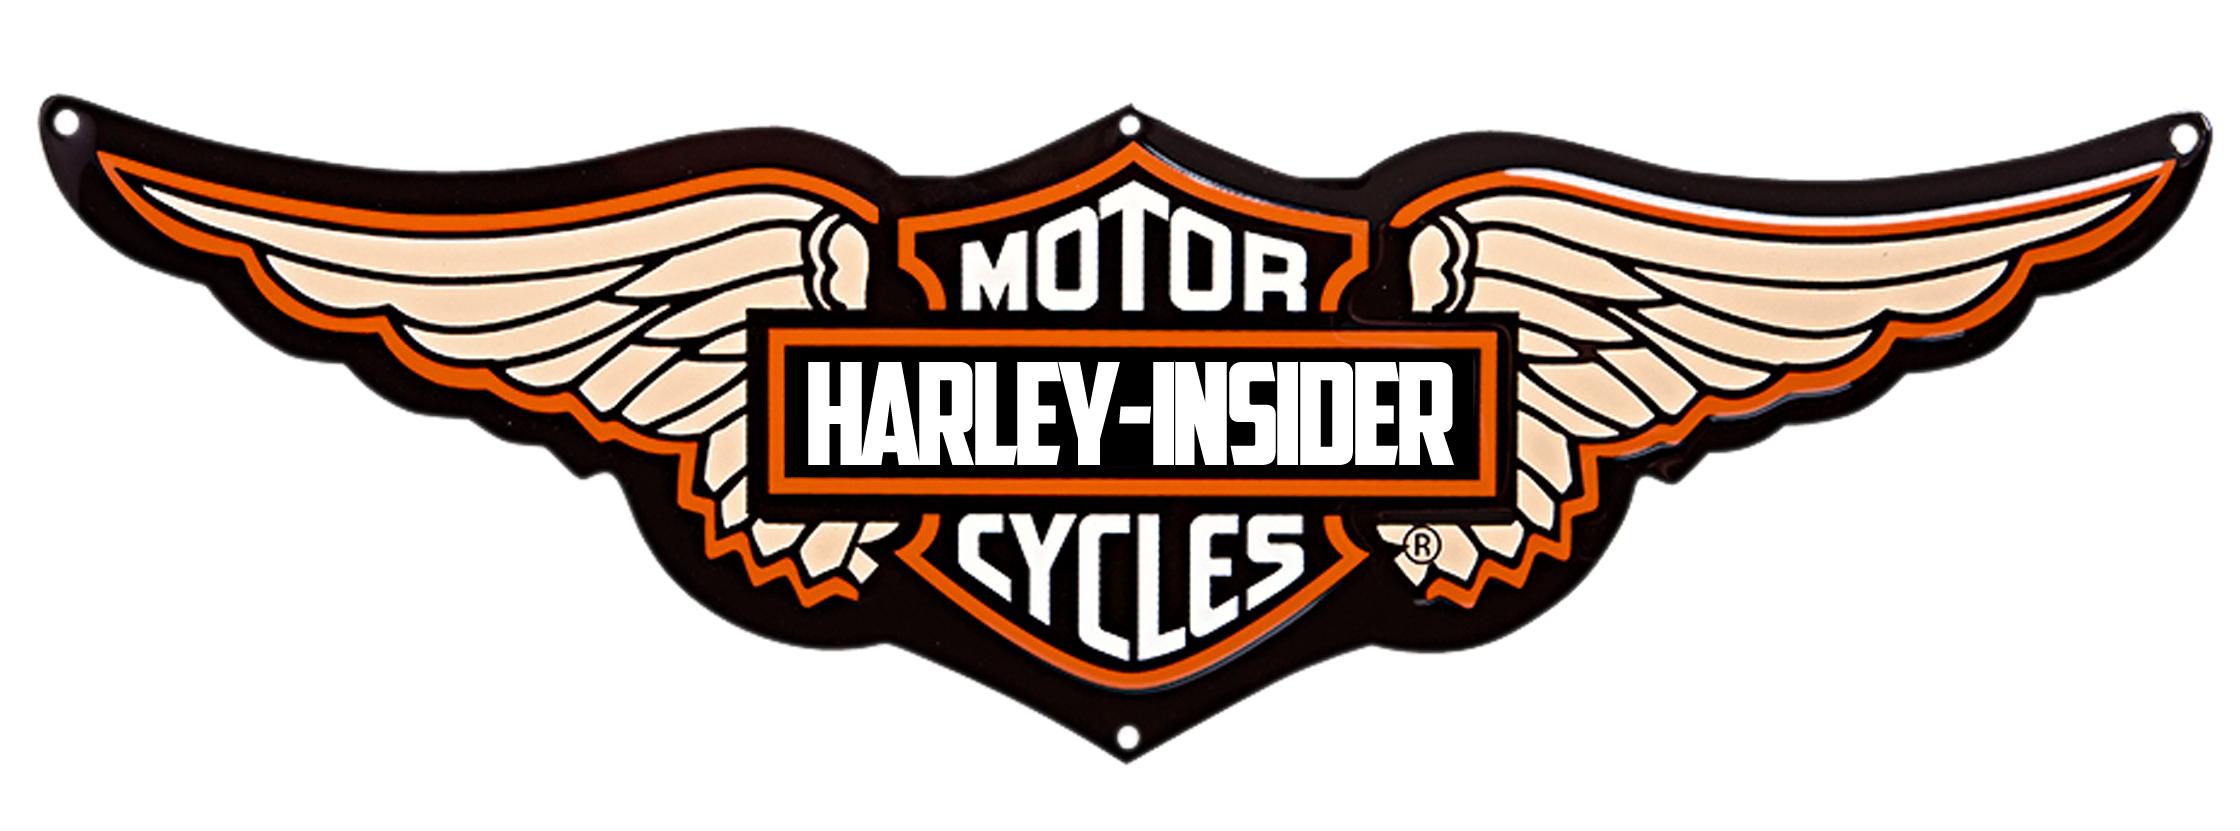 harley davidson logo Logospikecom Famous and Vector Logos 2240x831